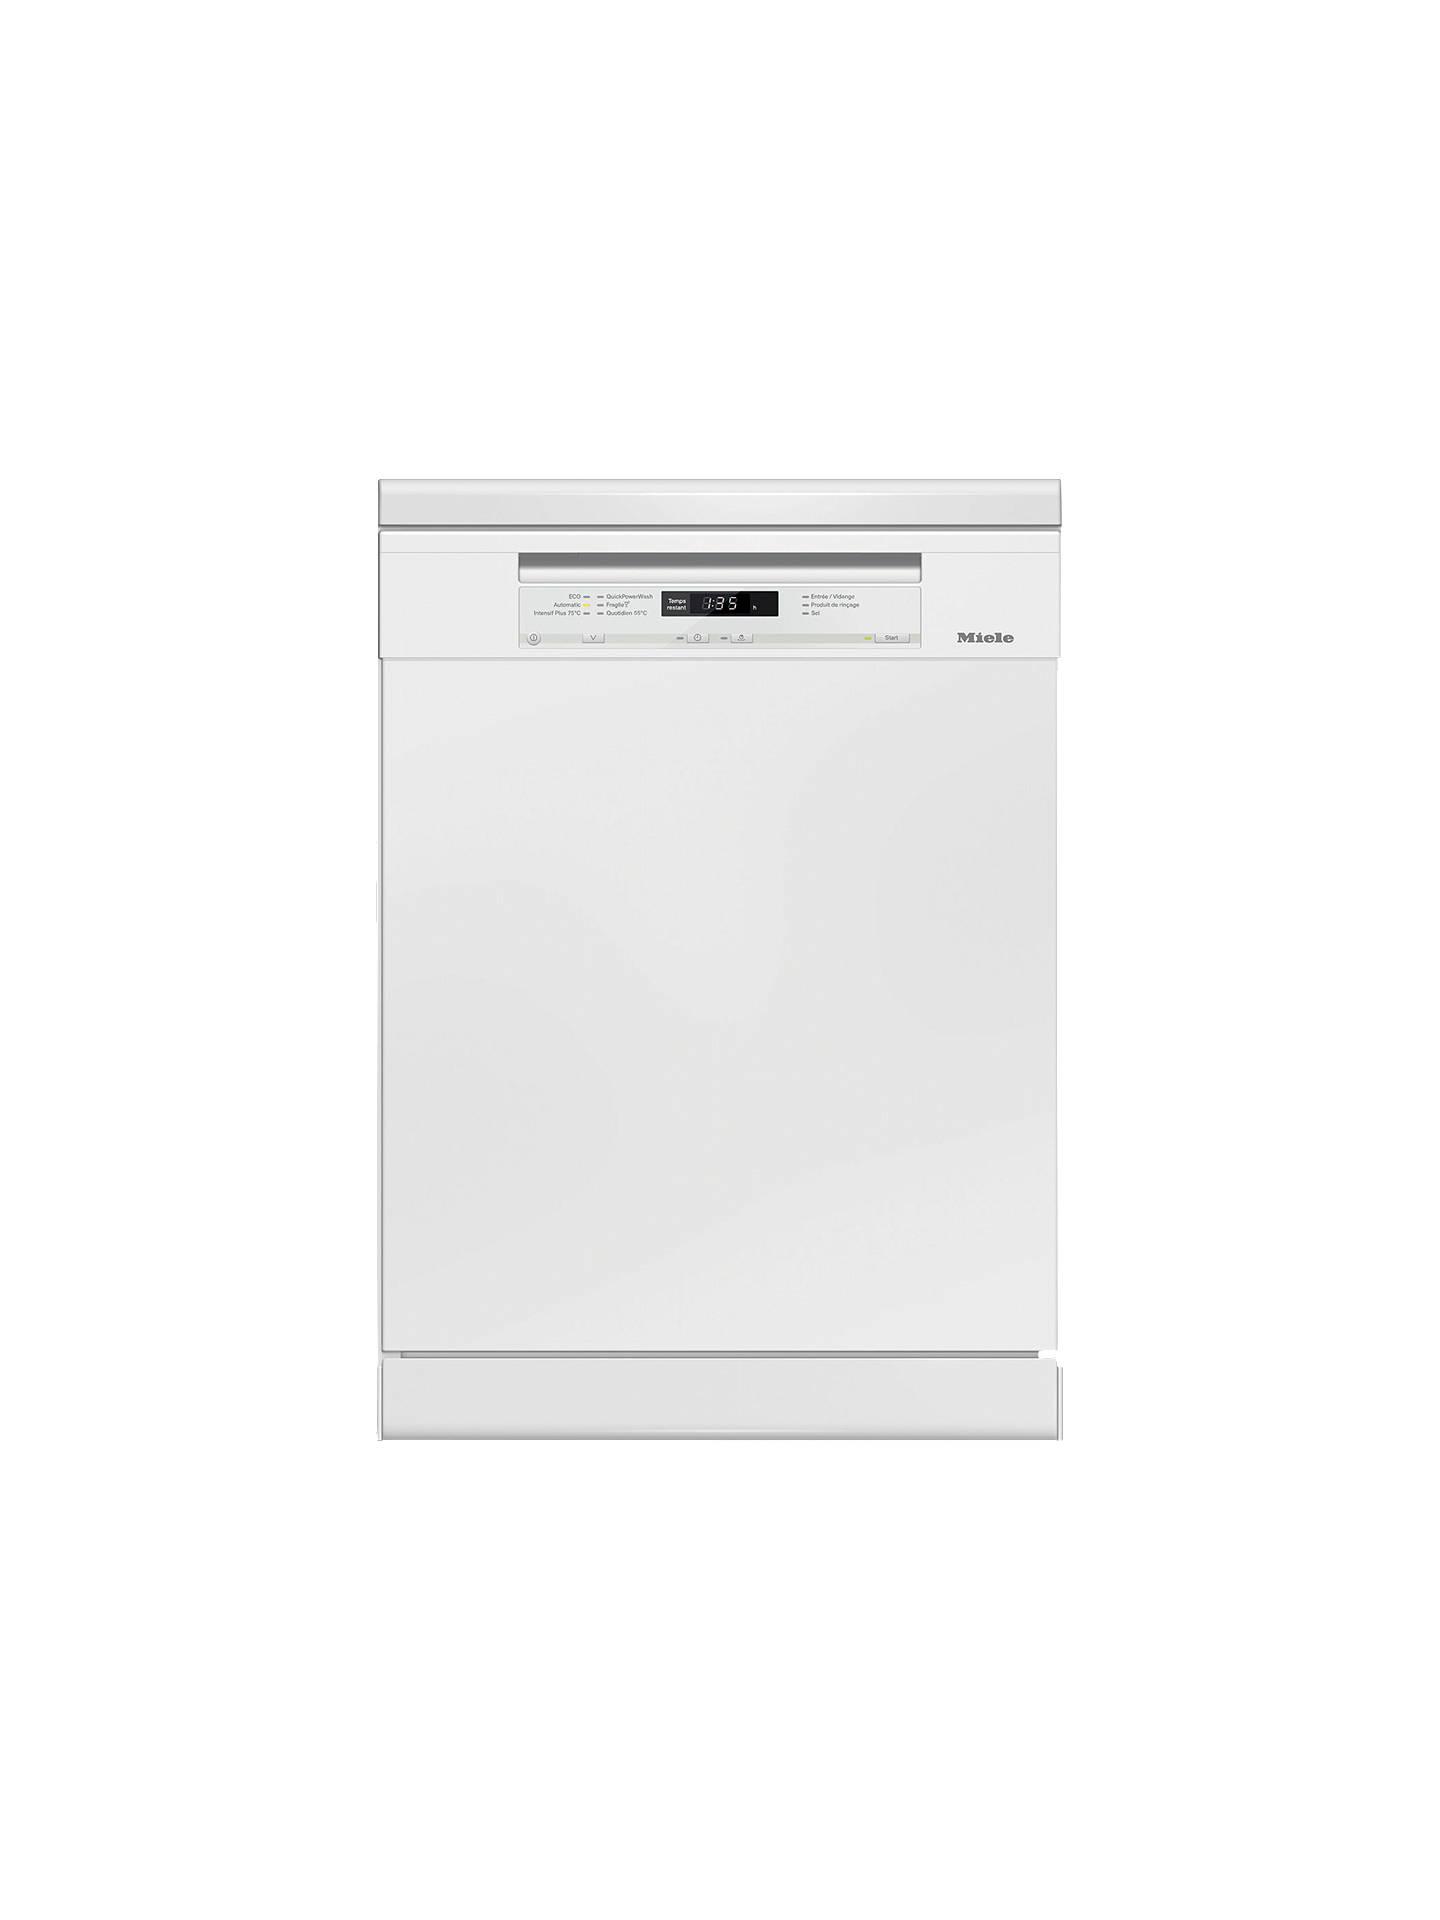 Miele Dishwasher Reviews >> Miele G6630sc Freestanding Dishwasher White